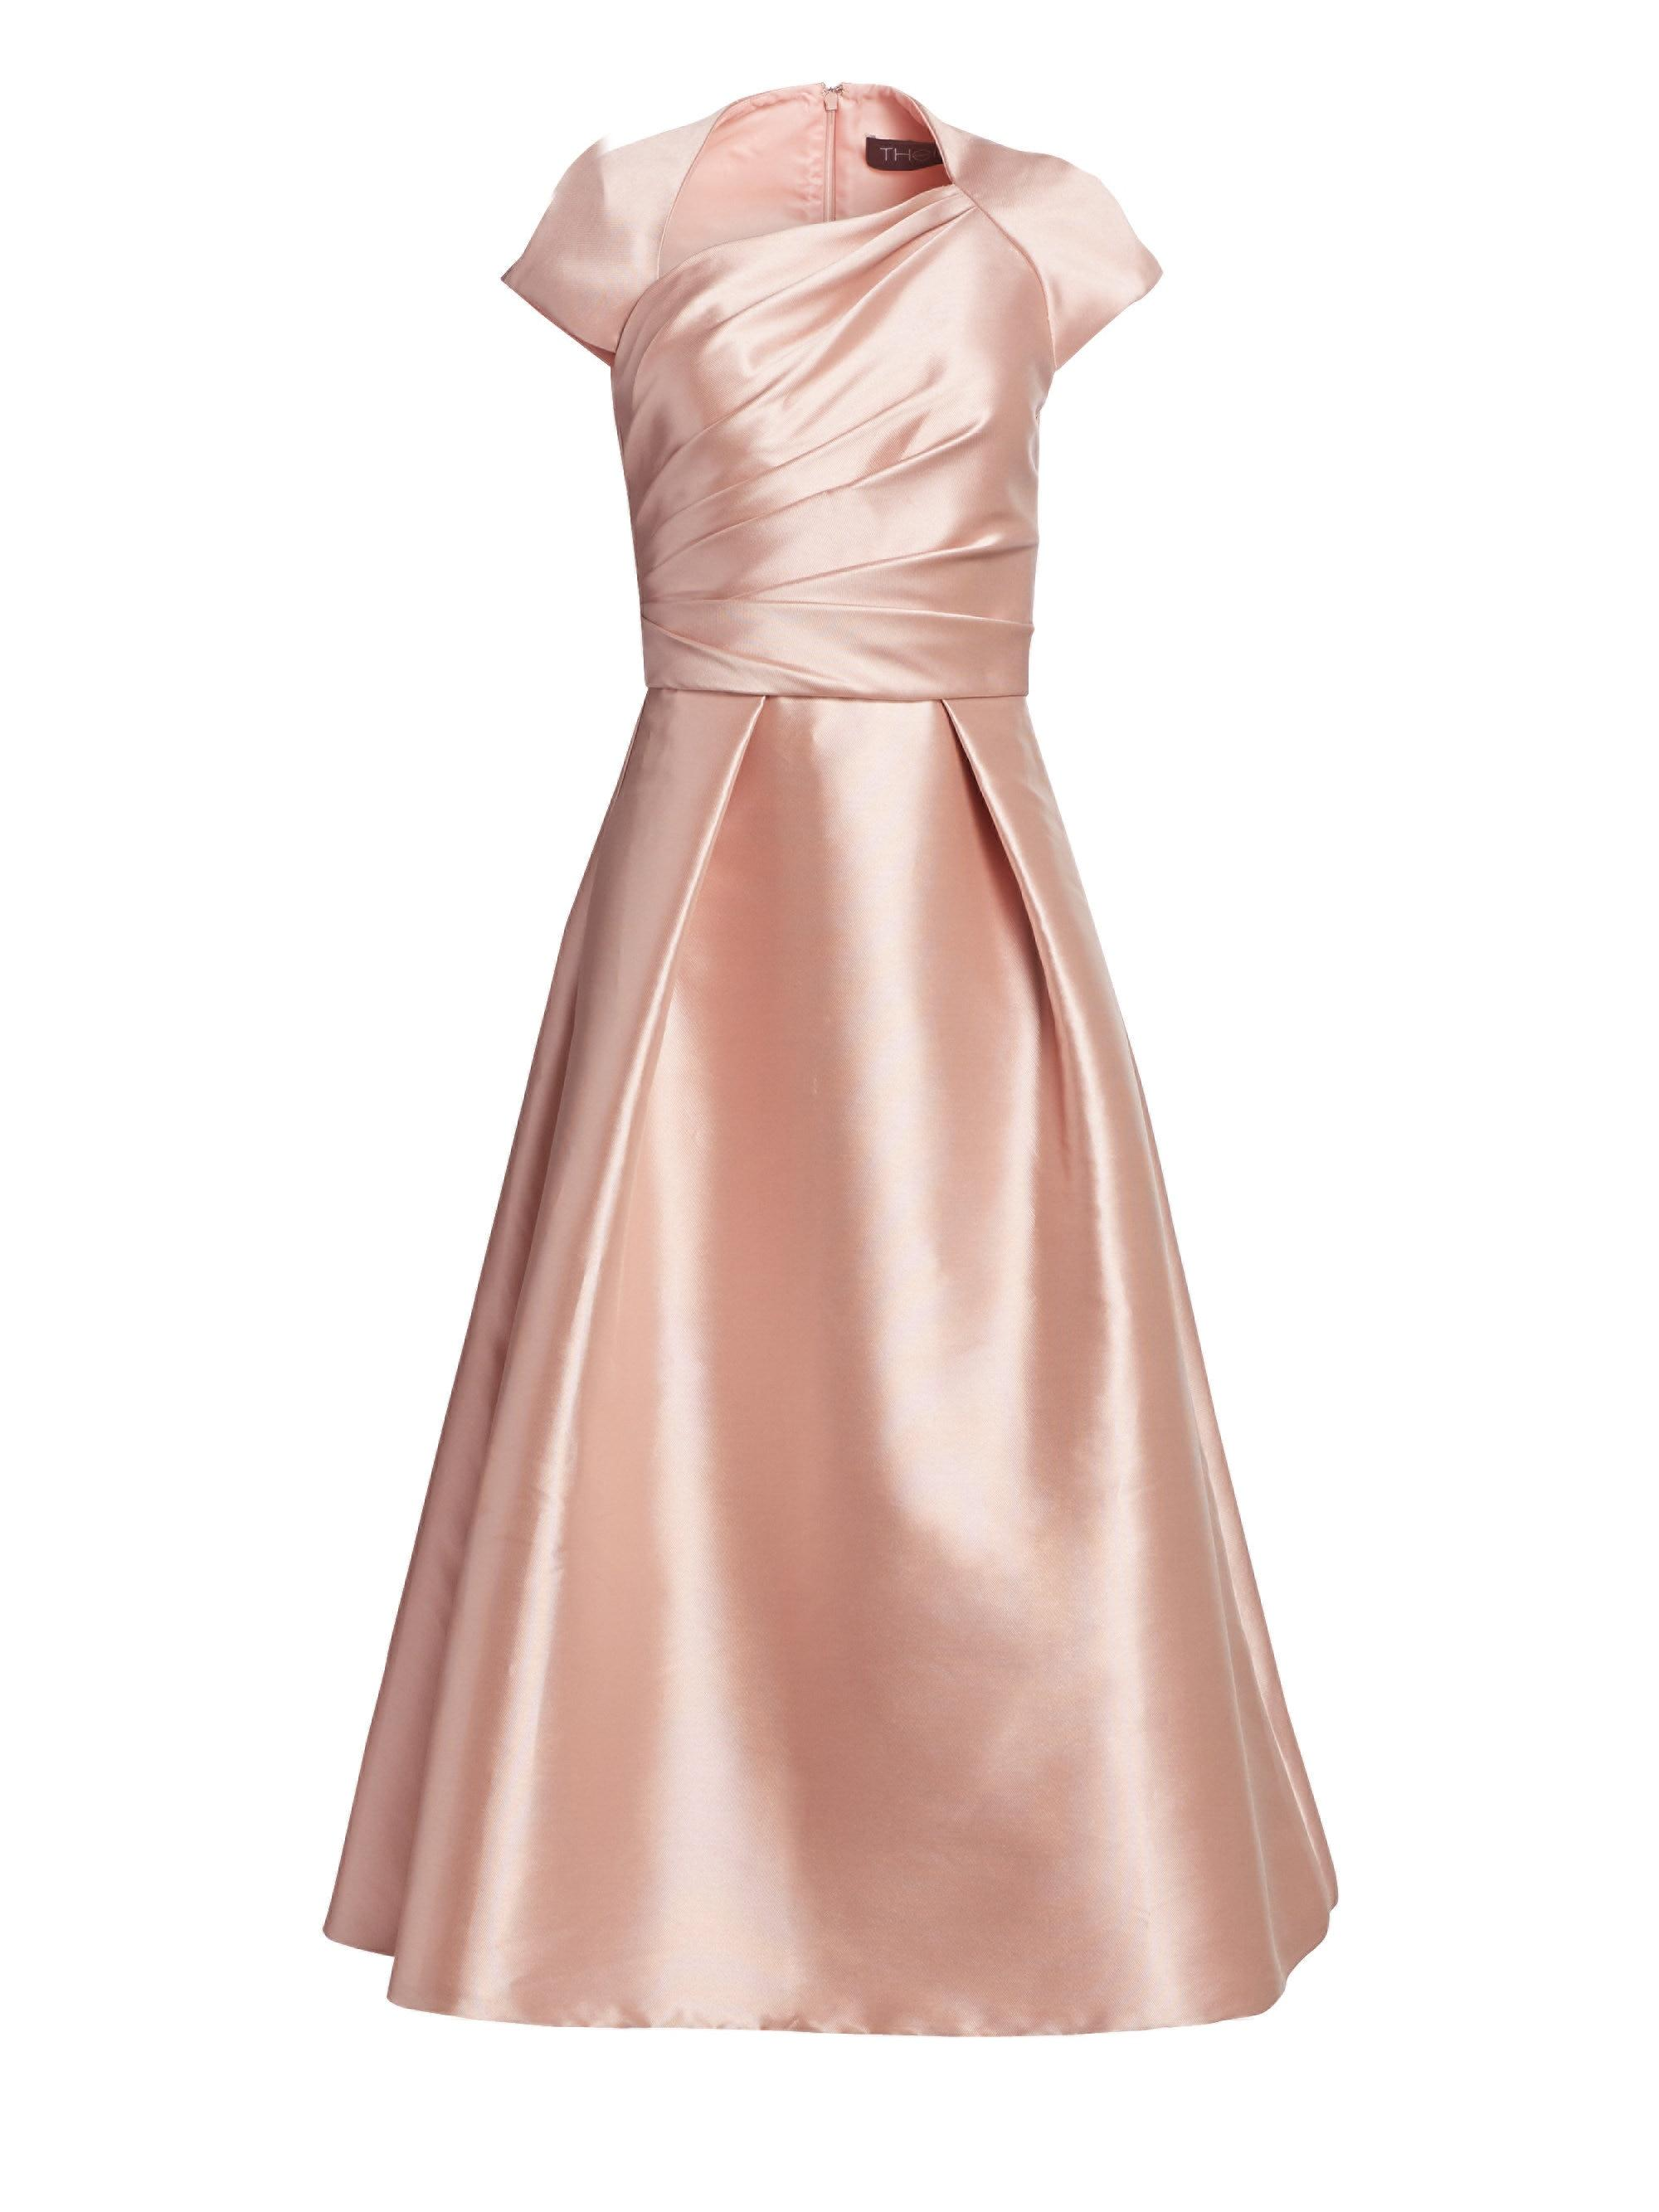 fe84d97dae THEIA Women s Draped-bodice Tea-length Dress - Blush in Pink - Lyst